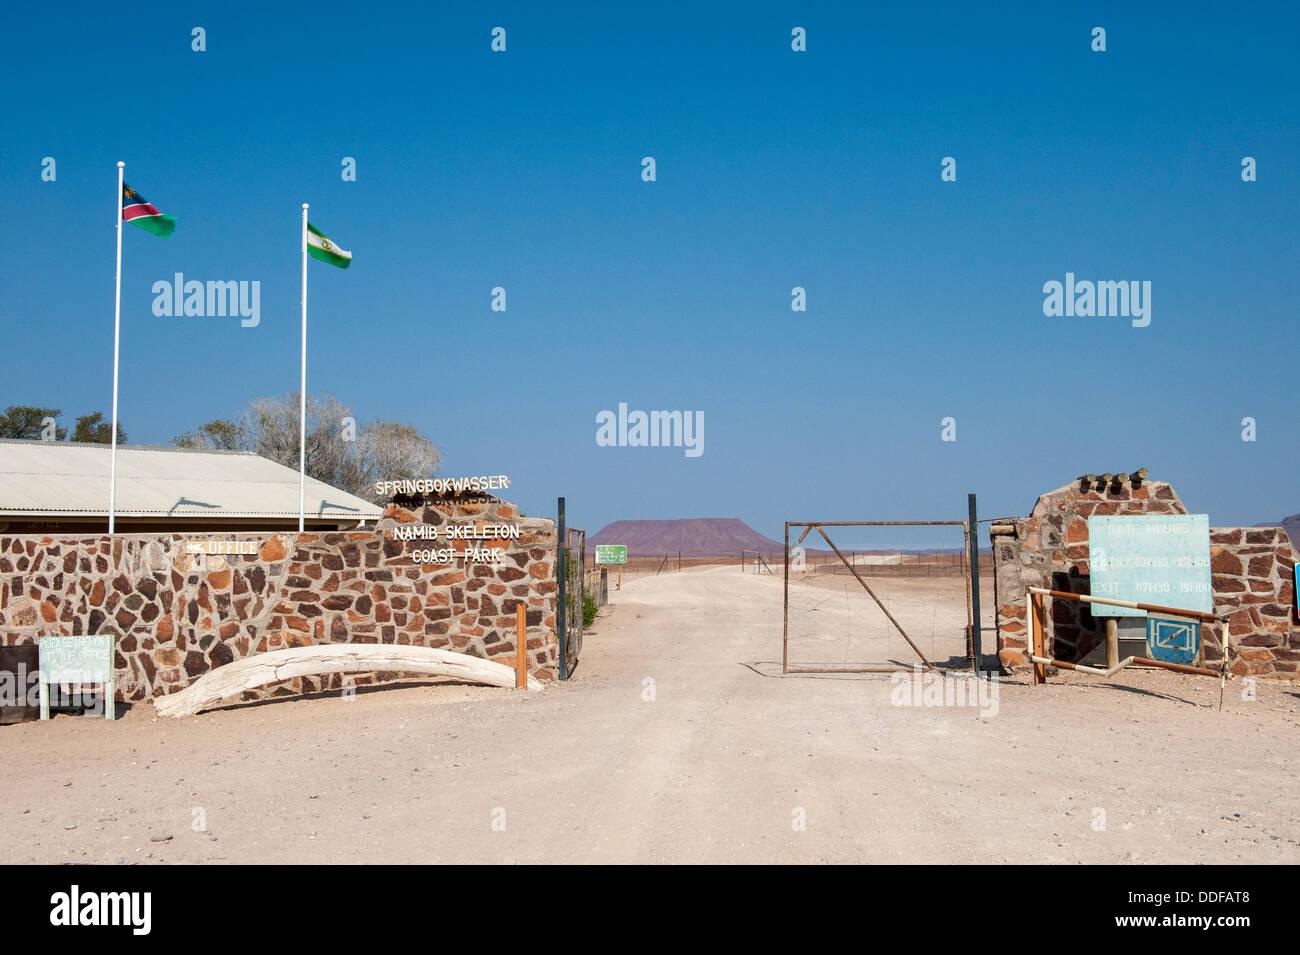 Entrance of Namib Skeleton Coast Park at Springbokwasser, Namibia - Stock Image